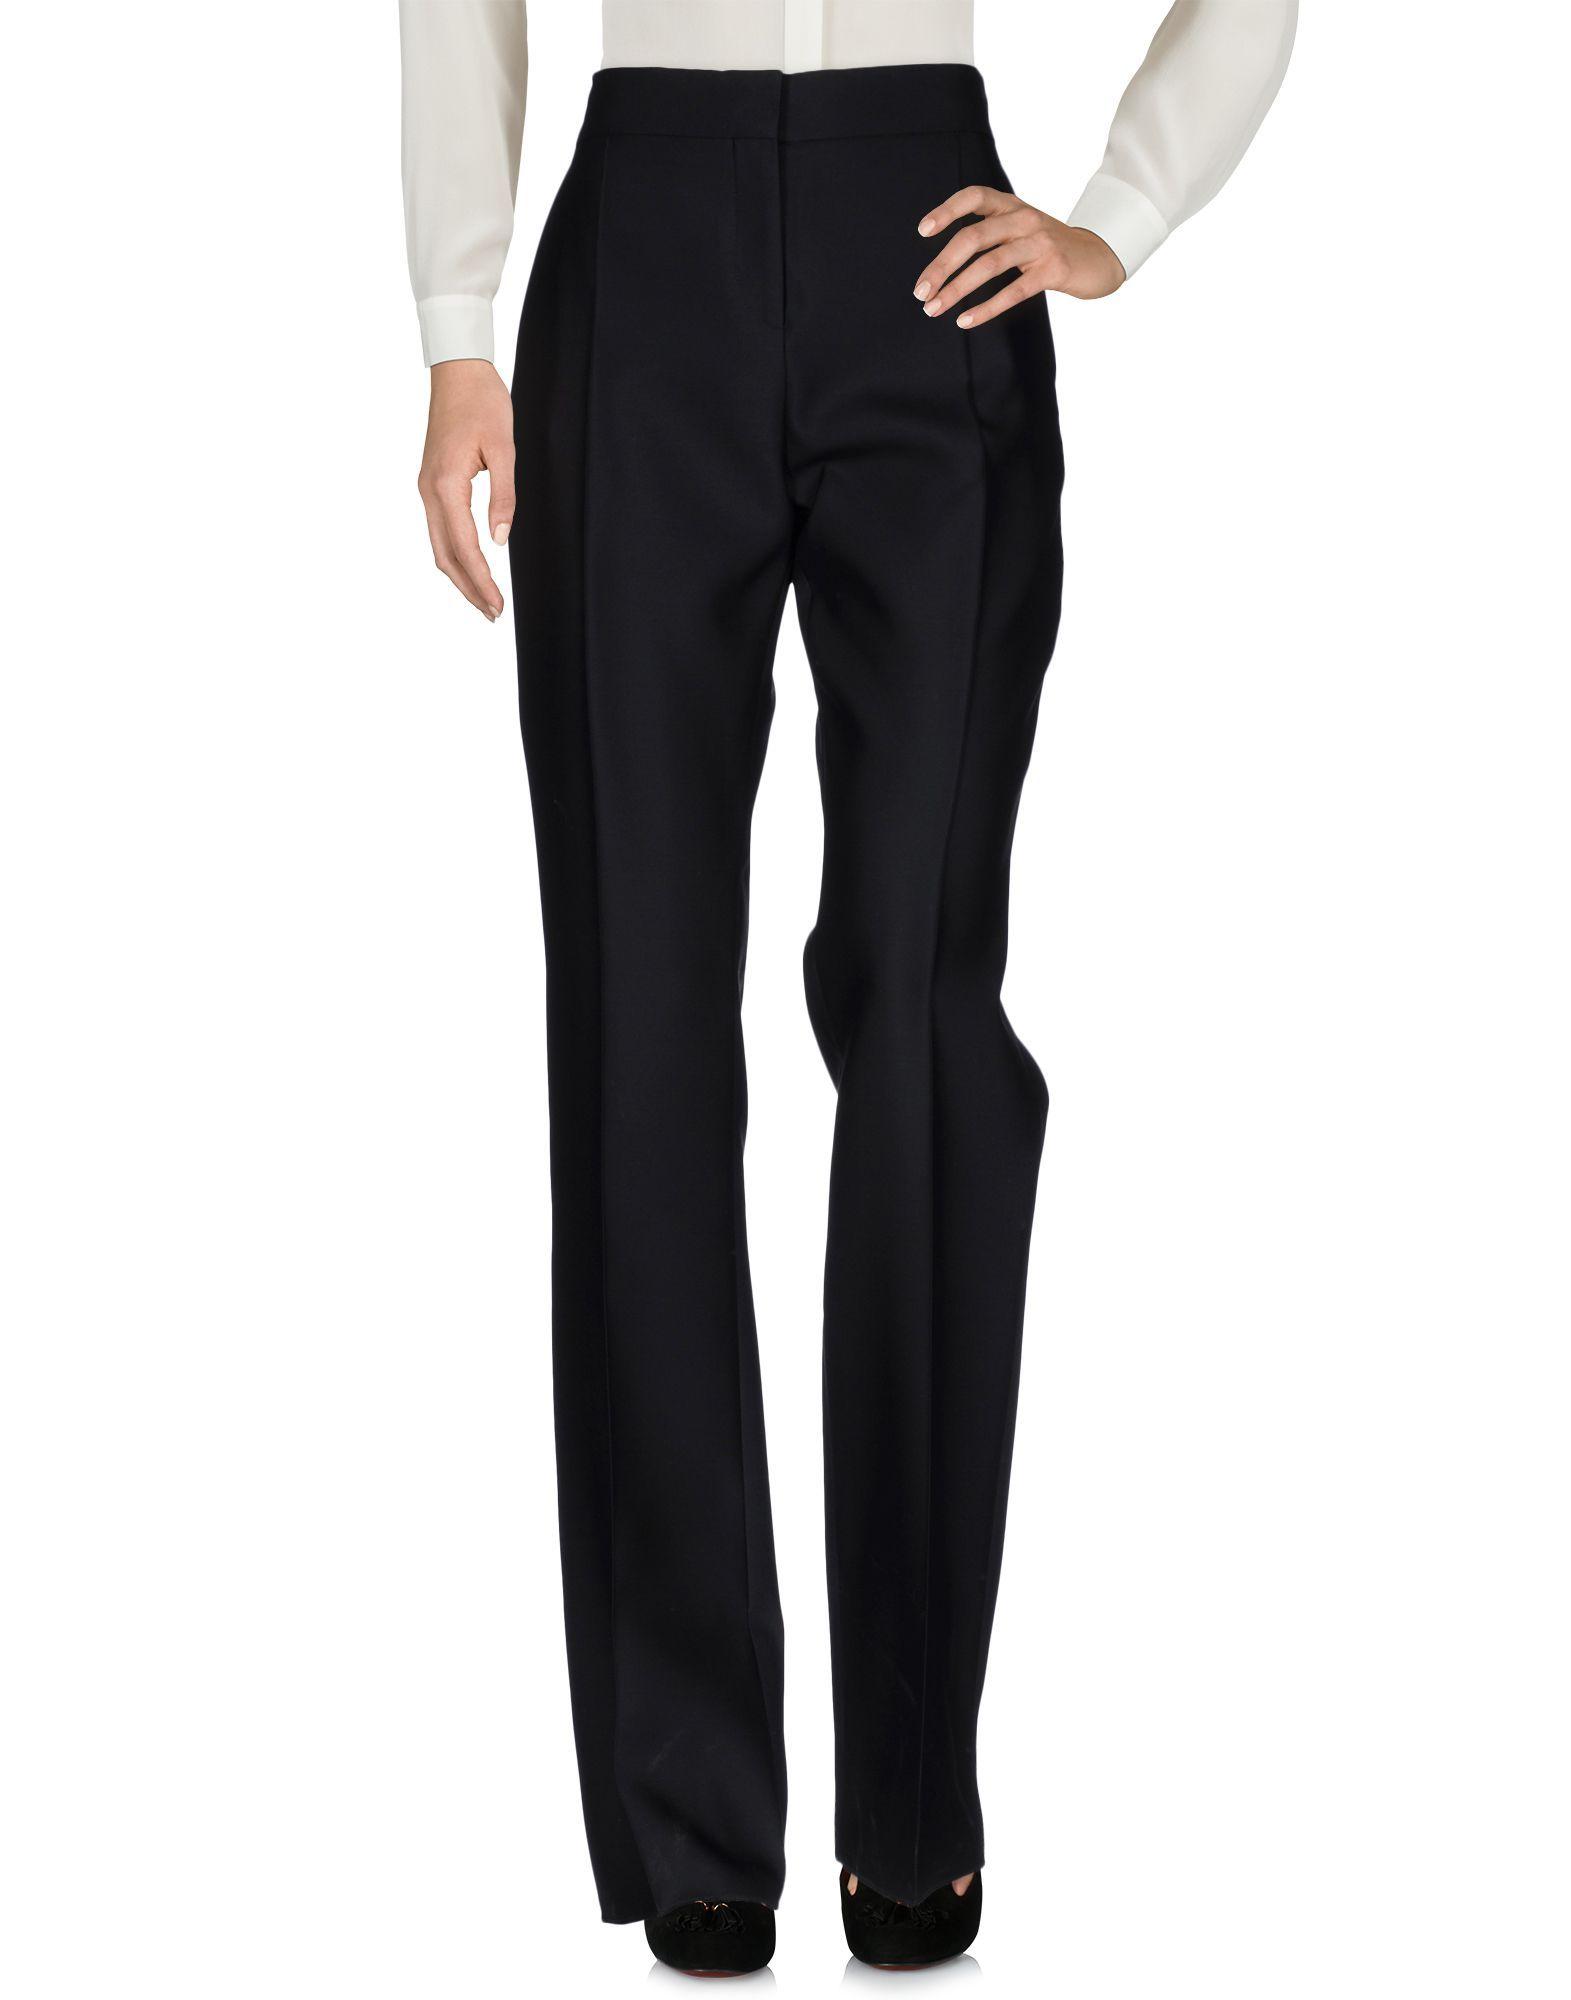 Valentino Black Virgin Wool Casual Trousers